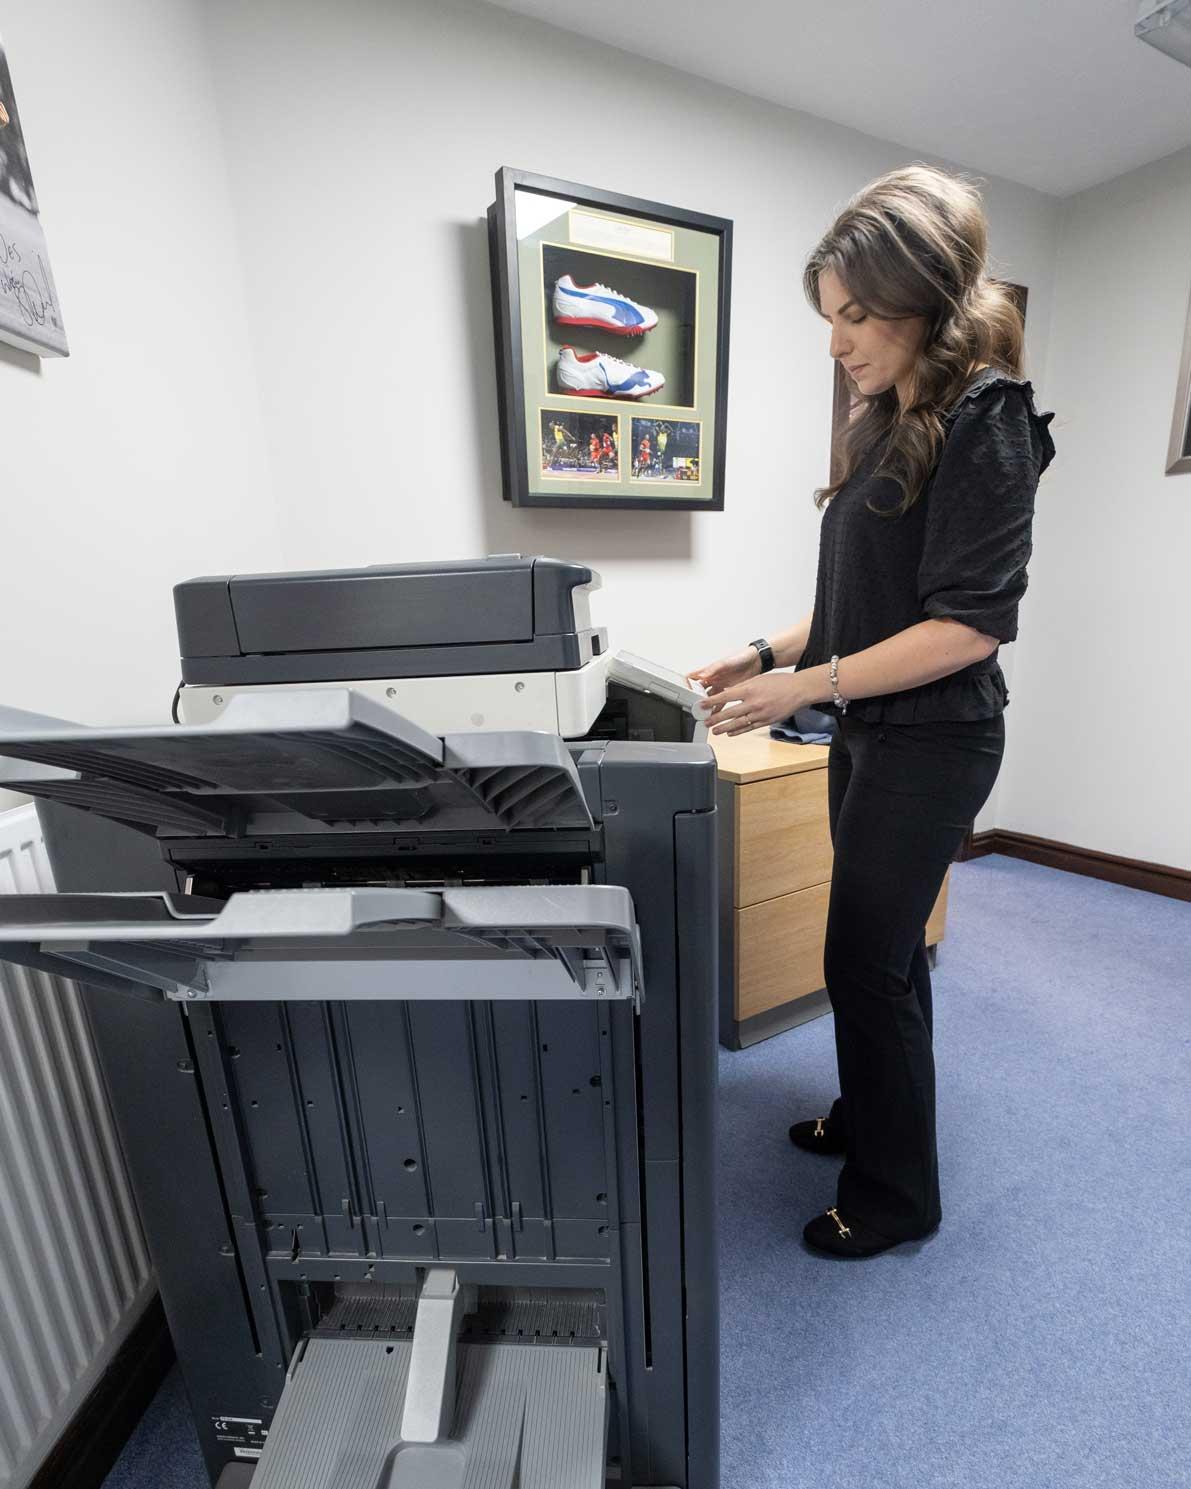 Woman using MFD Printer